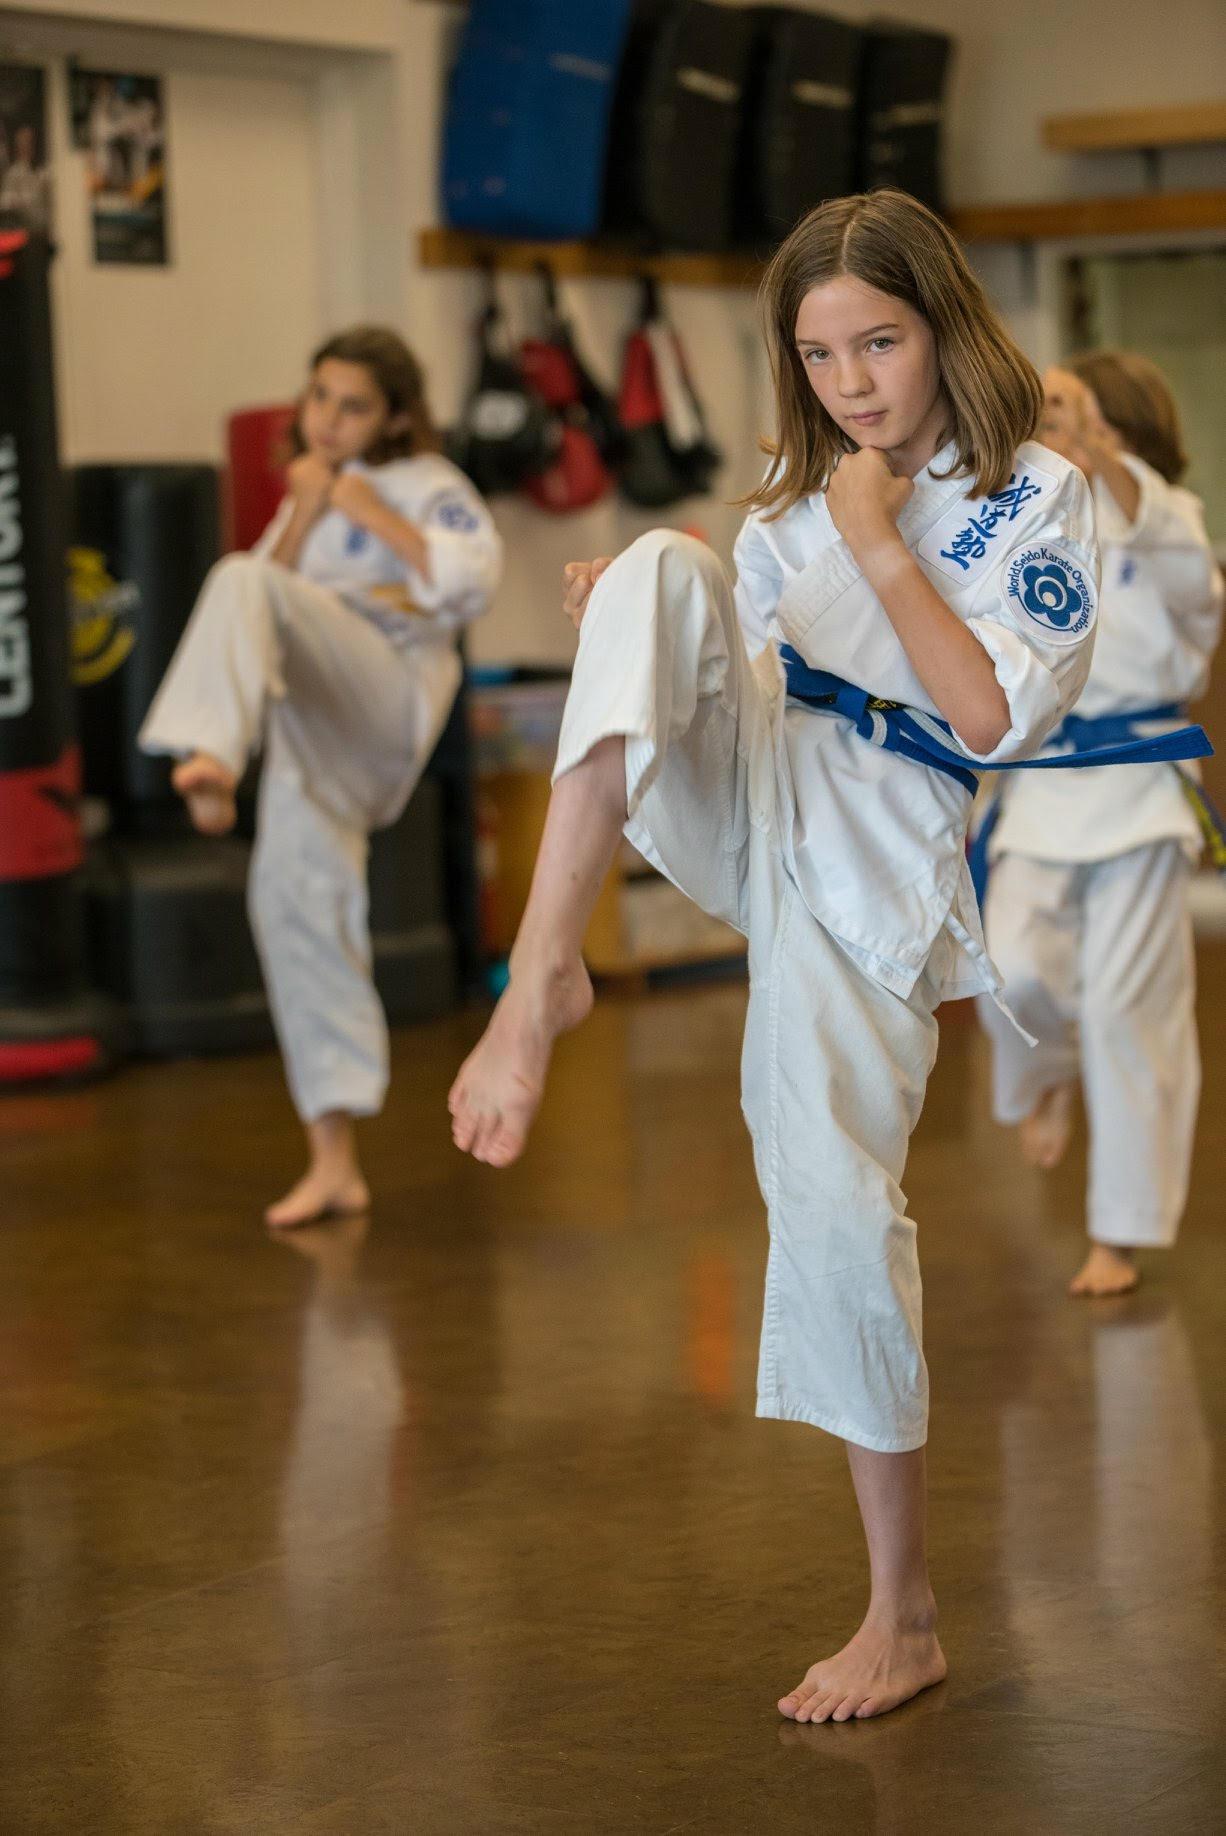 Female child knee kick